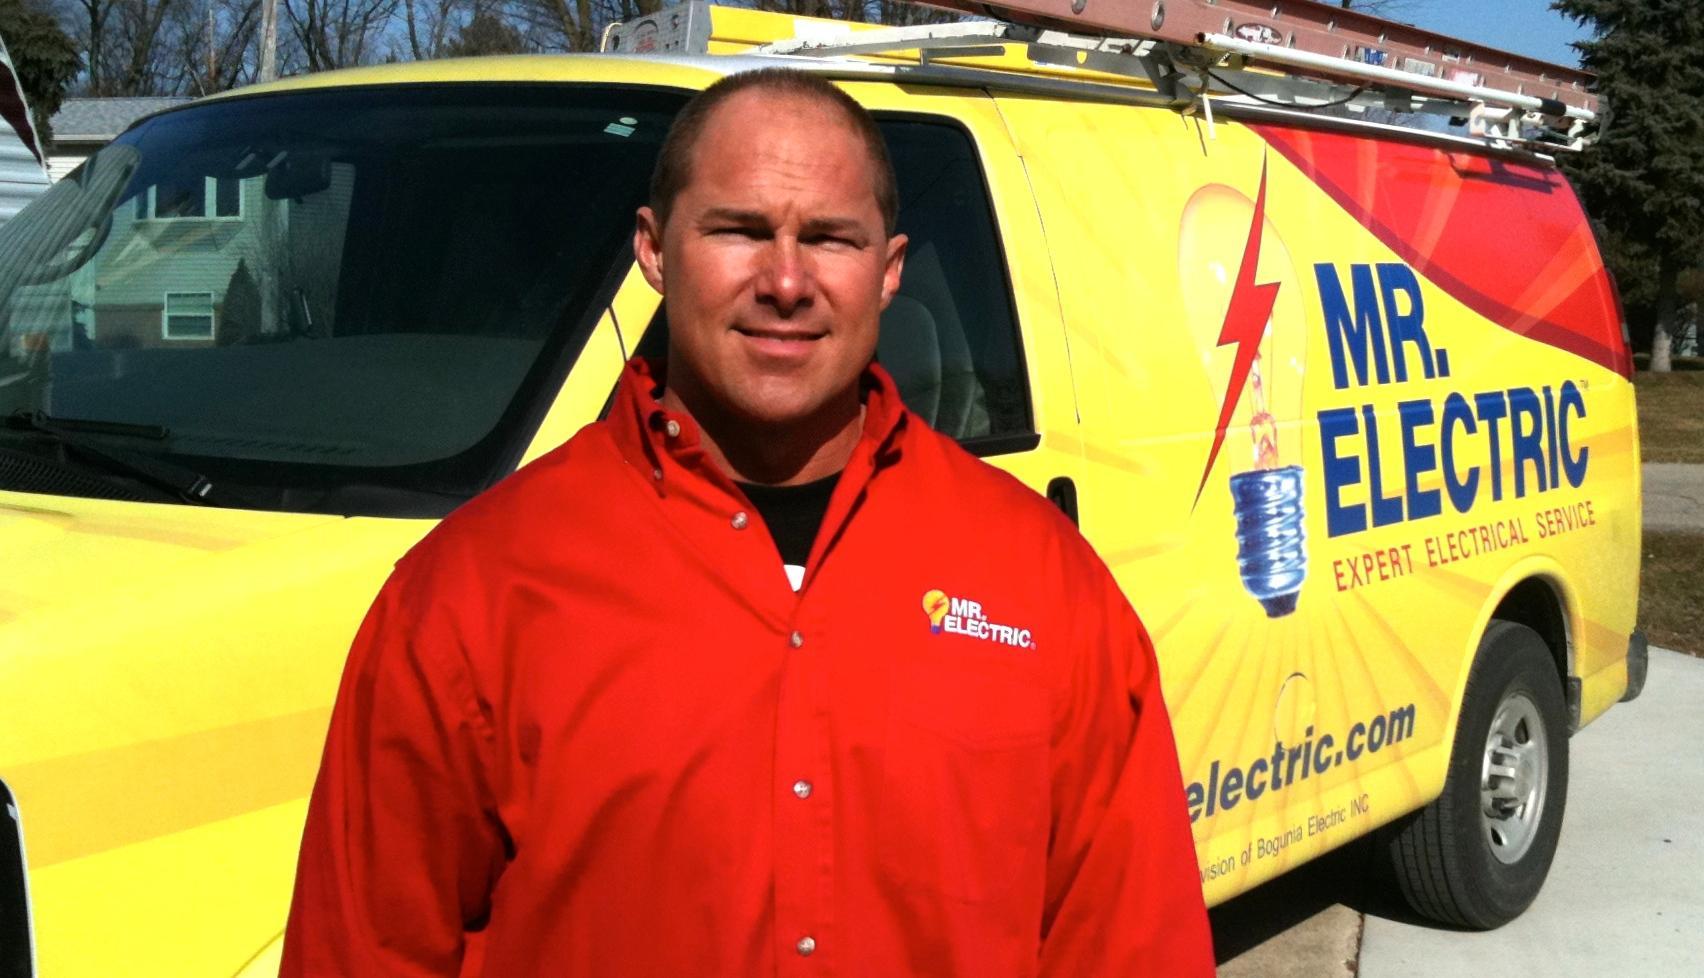 Mr. Electric of St. Joseph County